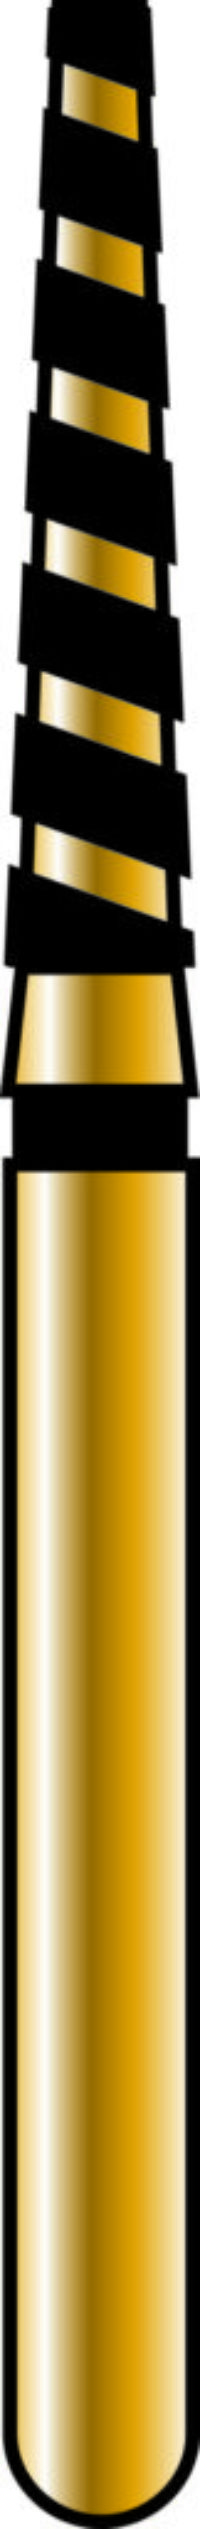 Flat End Taper 16-8mm Topspin Diamond